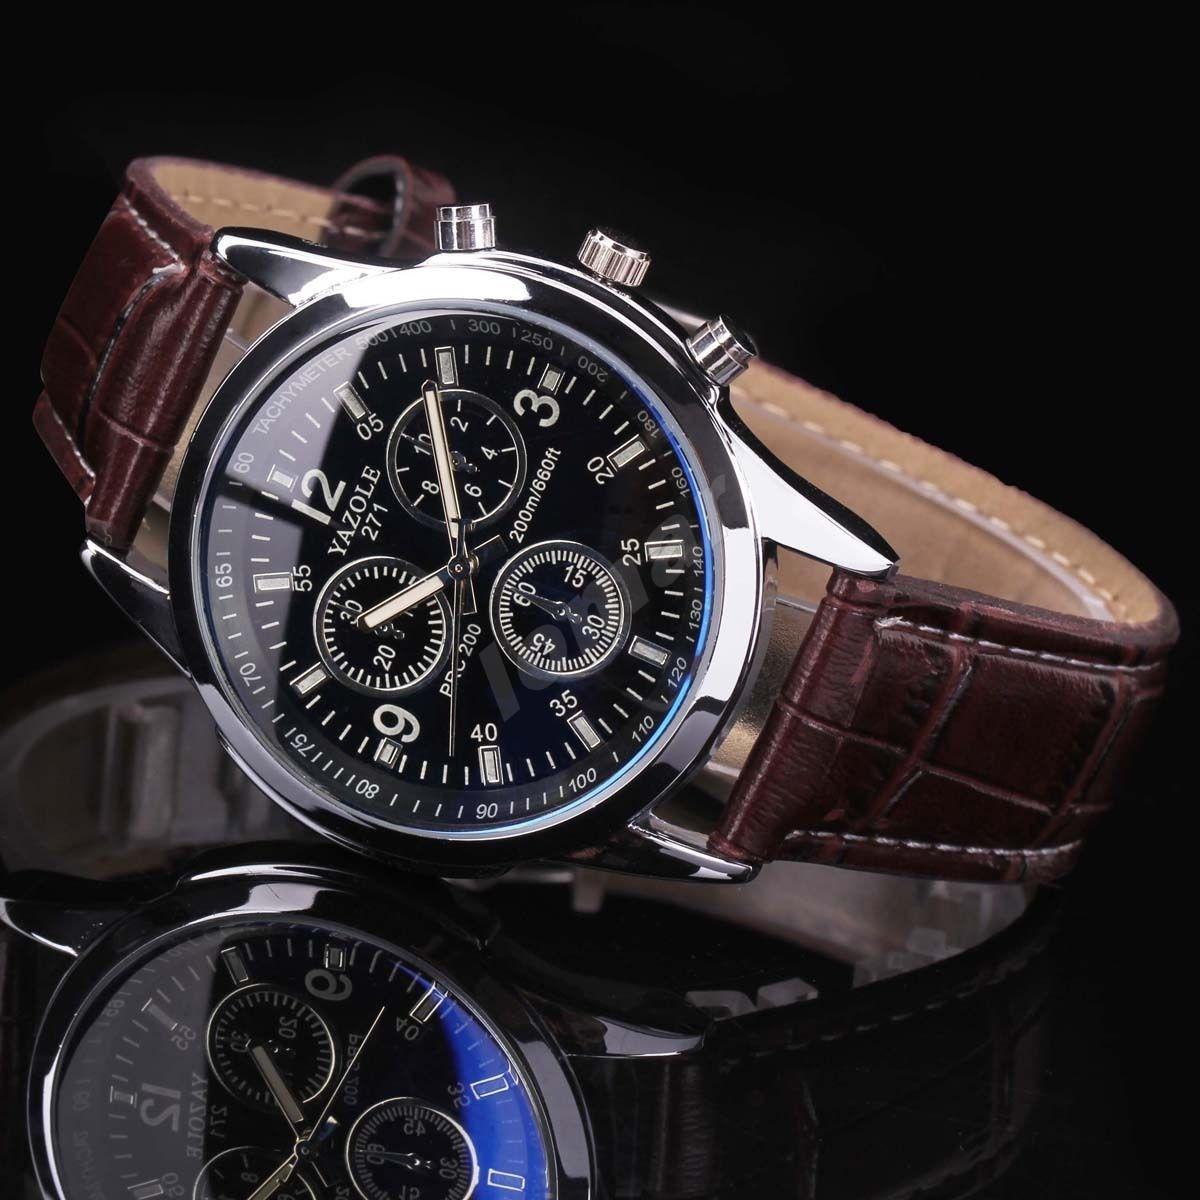 Мужские кварцевые часы Yazole Phantom blue mirror - lomarua в Украине a935e04214e